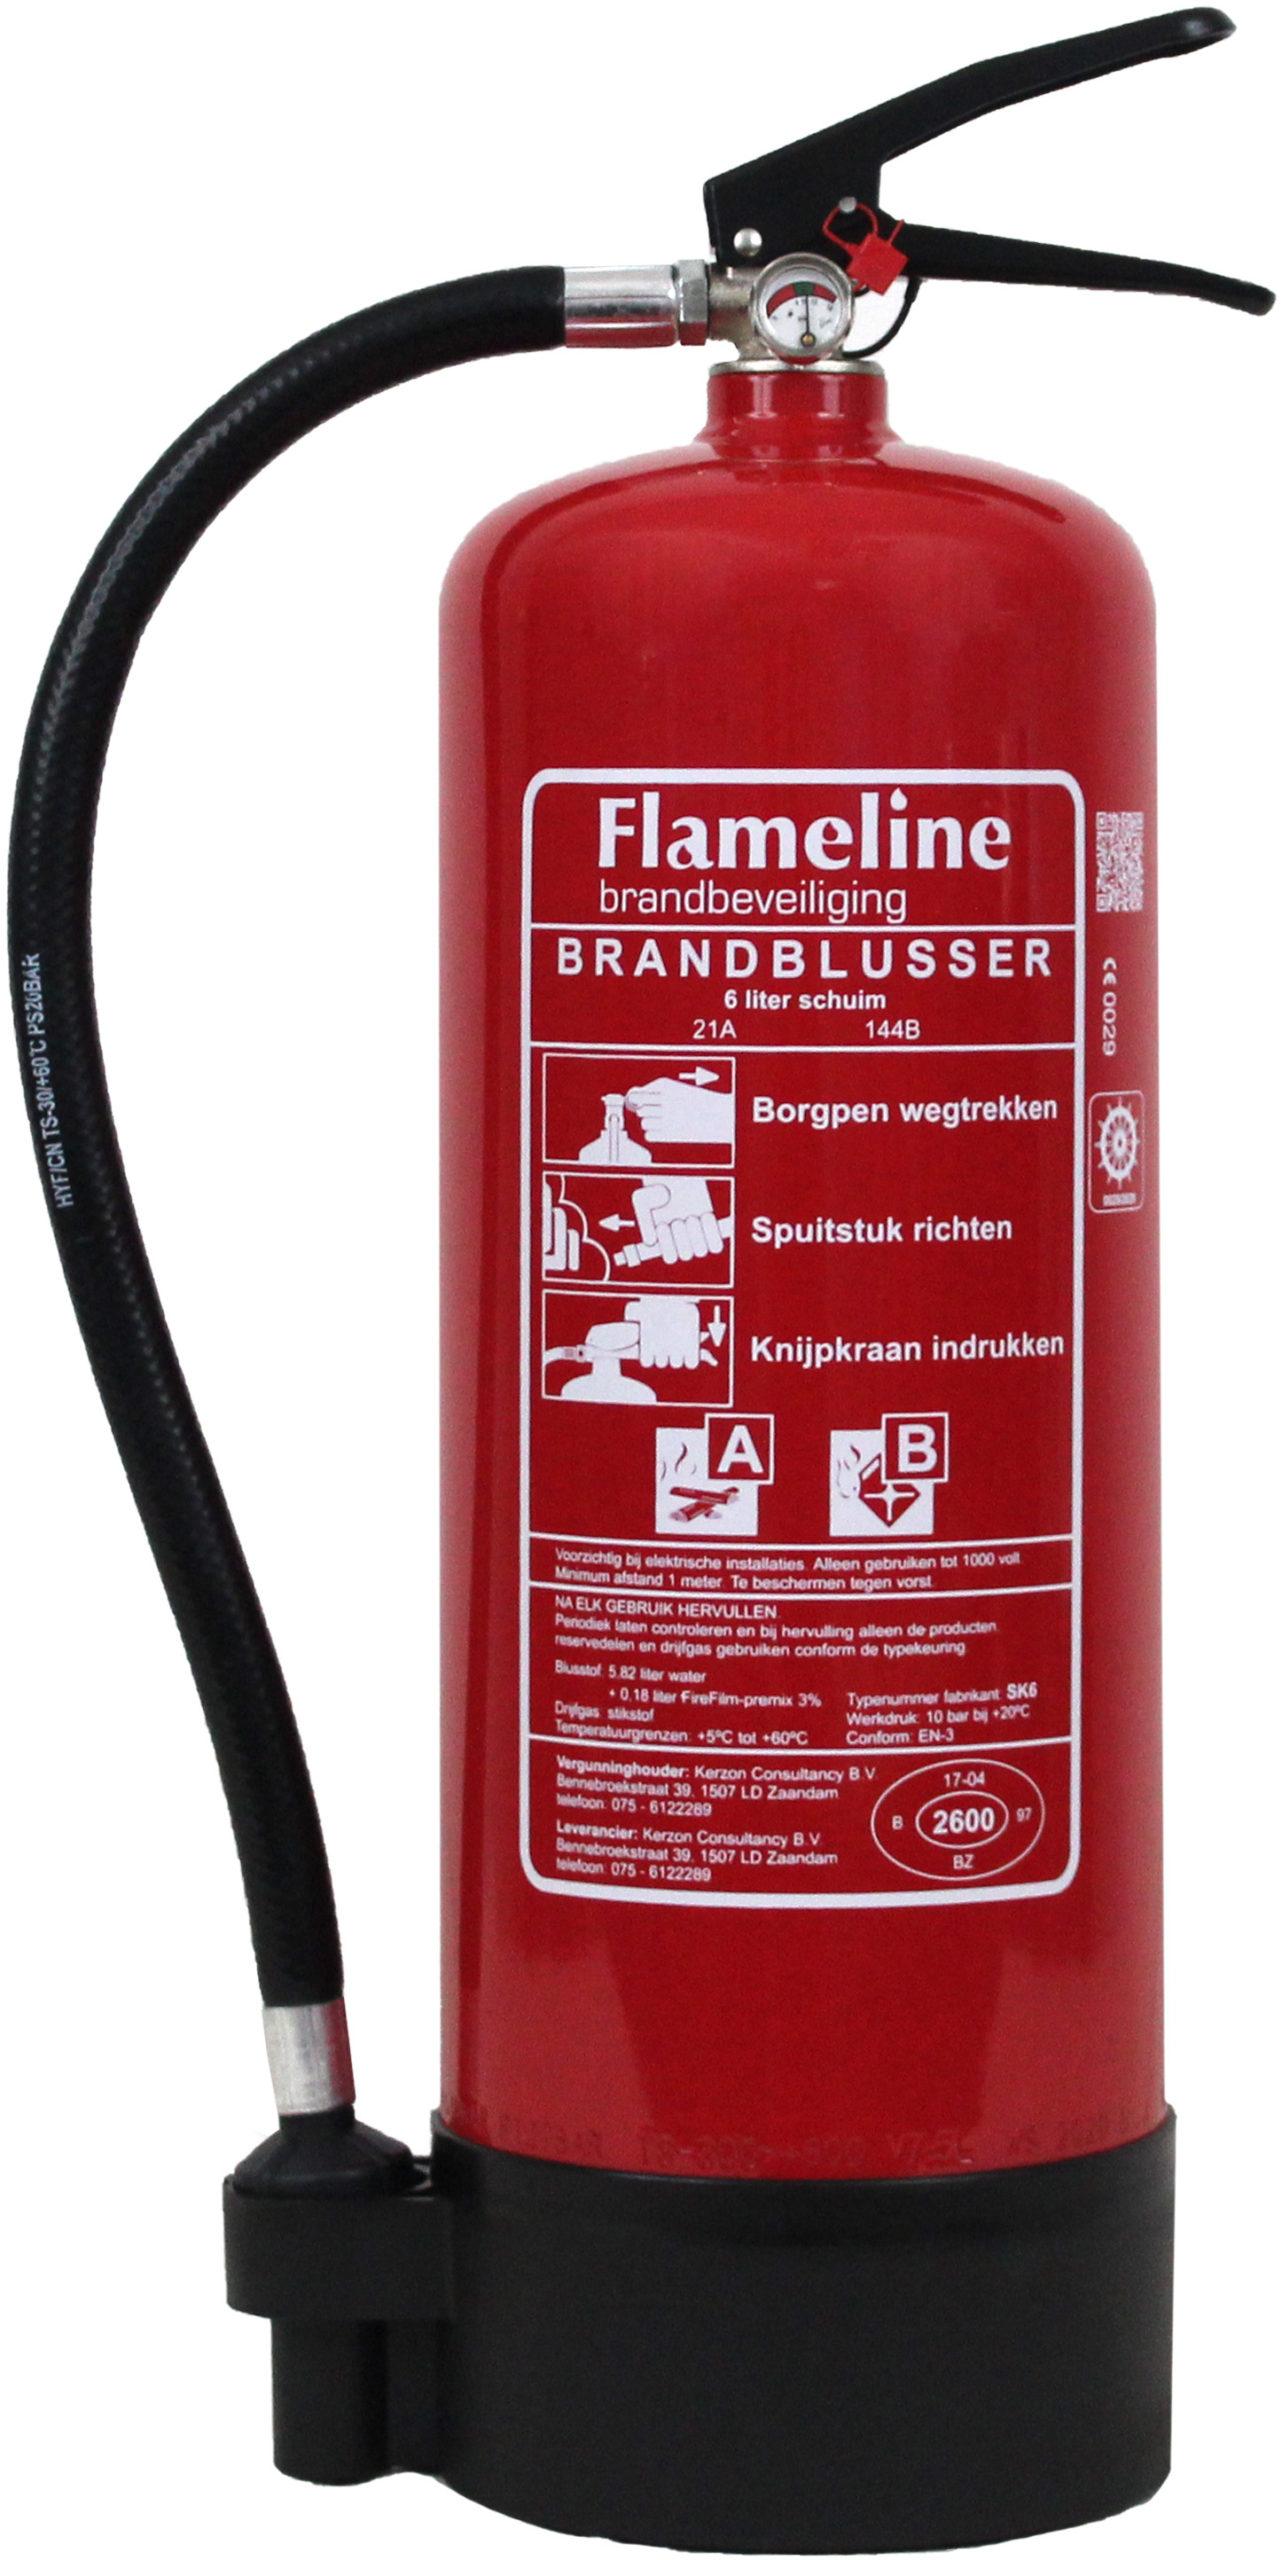 SK6 schuimblustoestel  6 liter budget  rating 21A-144B